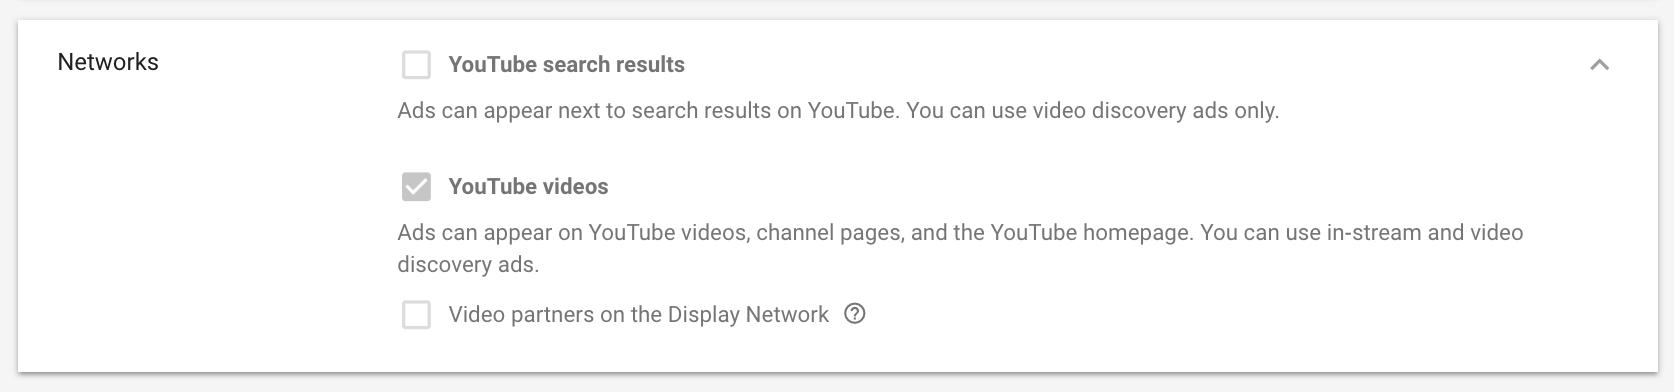 Réseau YouTube Ads Networks